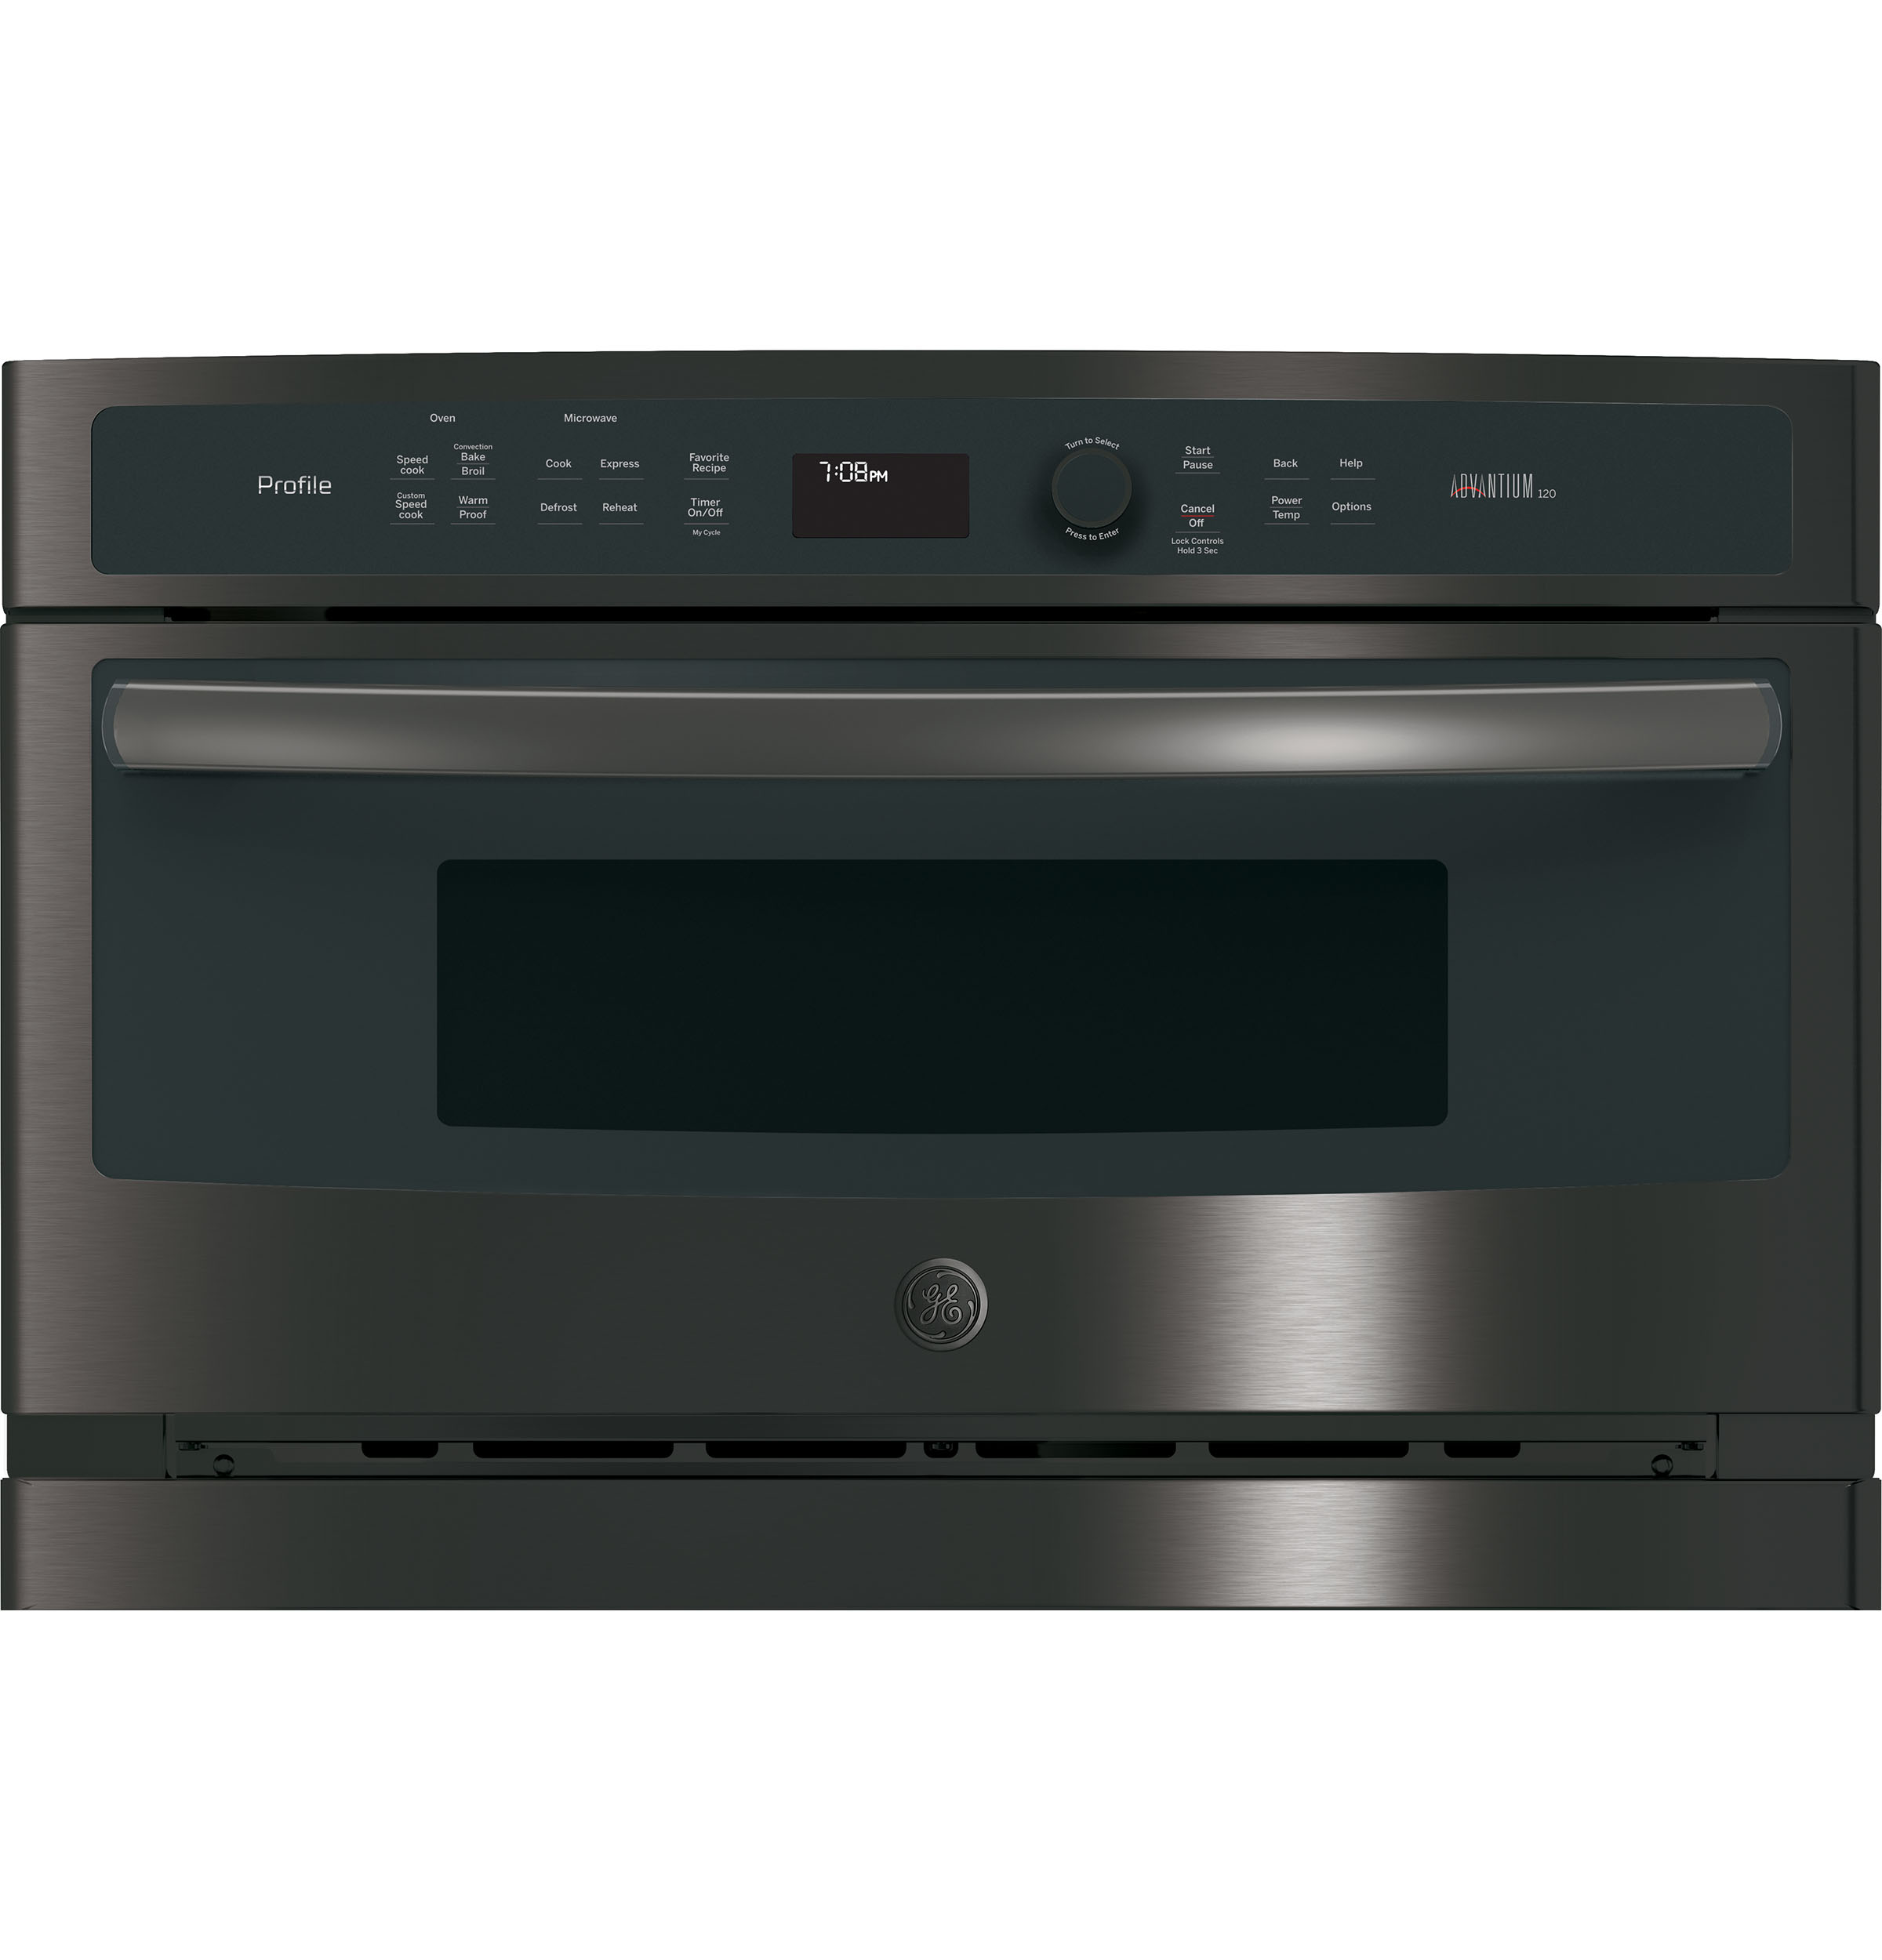 GE Profile GE Profile™ Series 27 in. Single Wall Oven Advantium® Technology